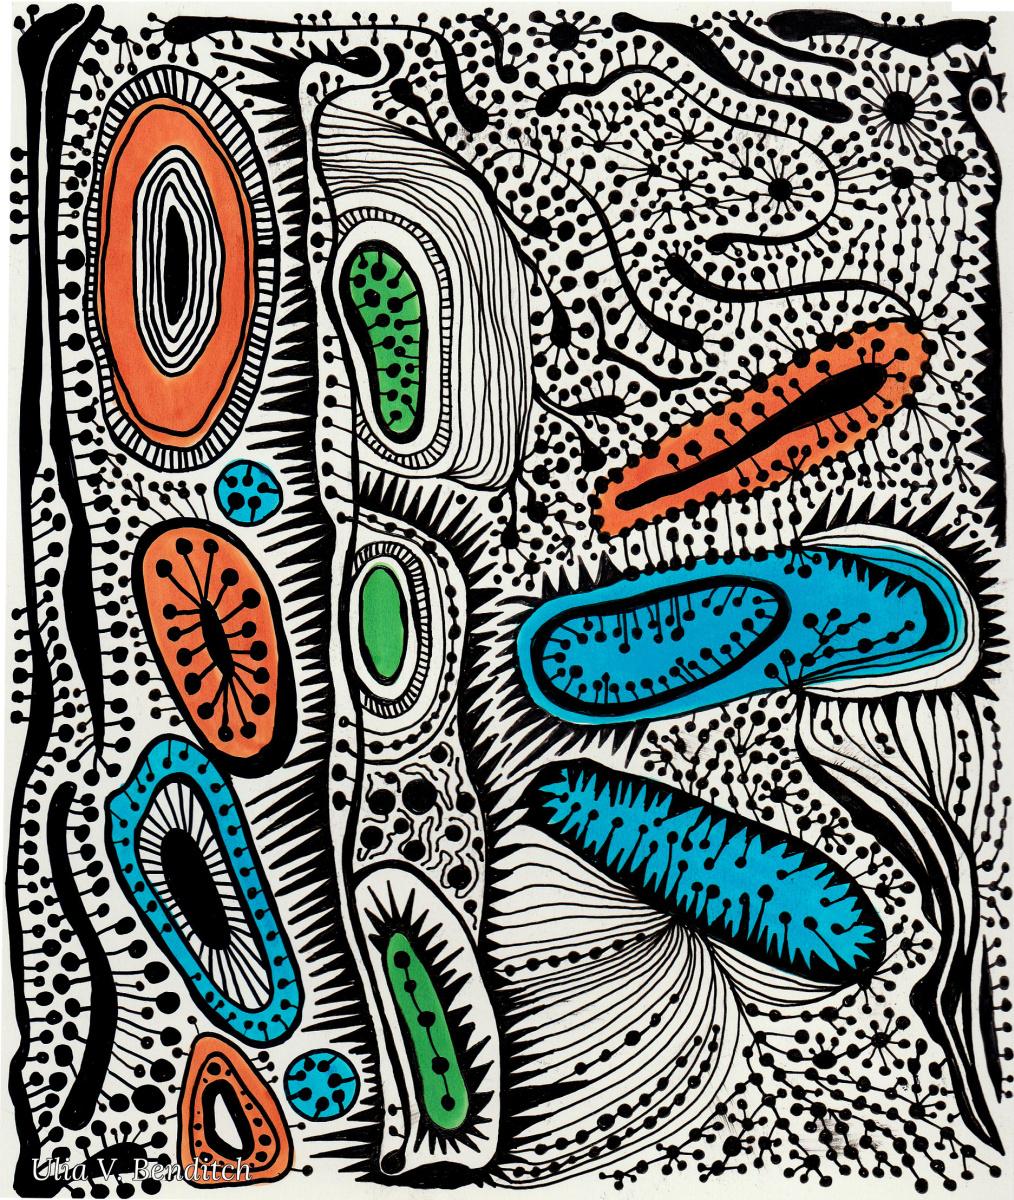 Ulia V. Benditch. Color collection